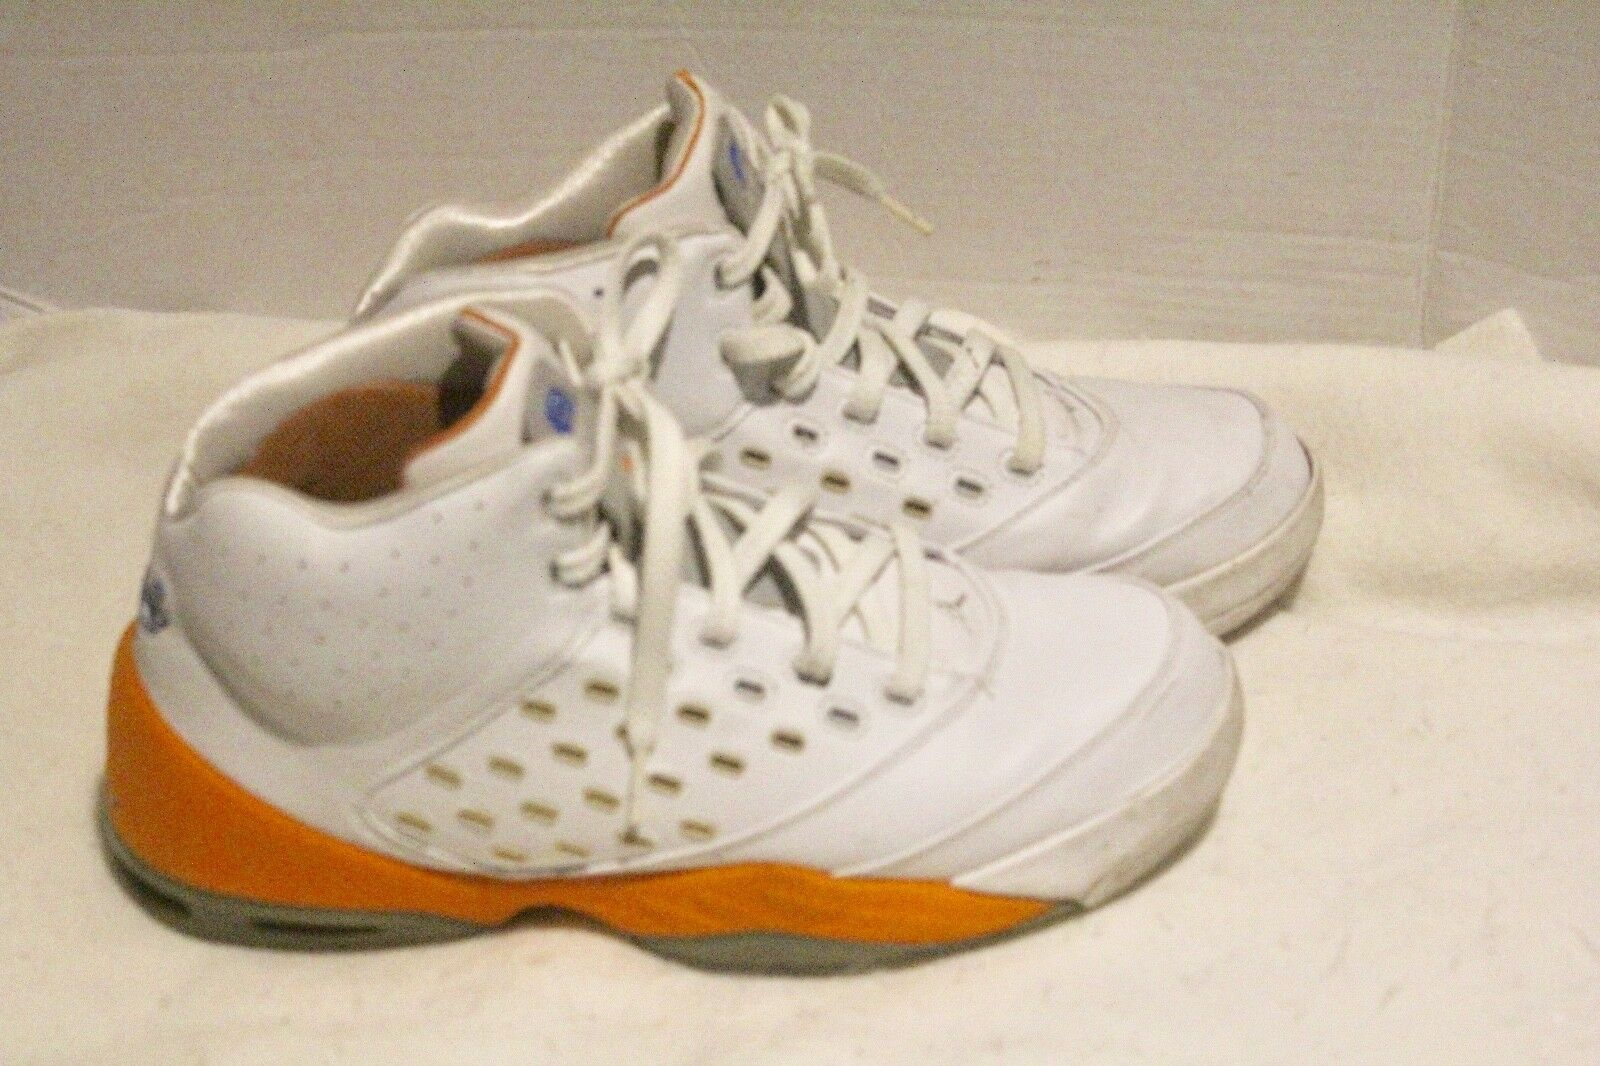 Women's Shoe Nike Air Max Thea Ultra SI 881119 101